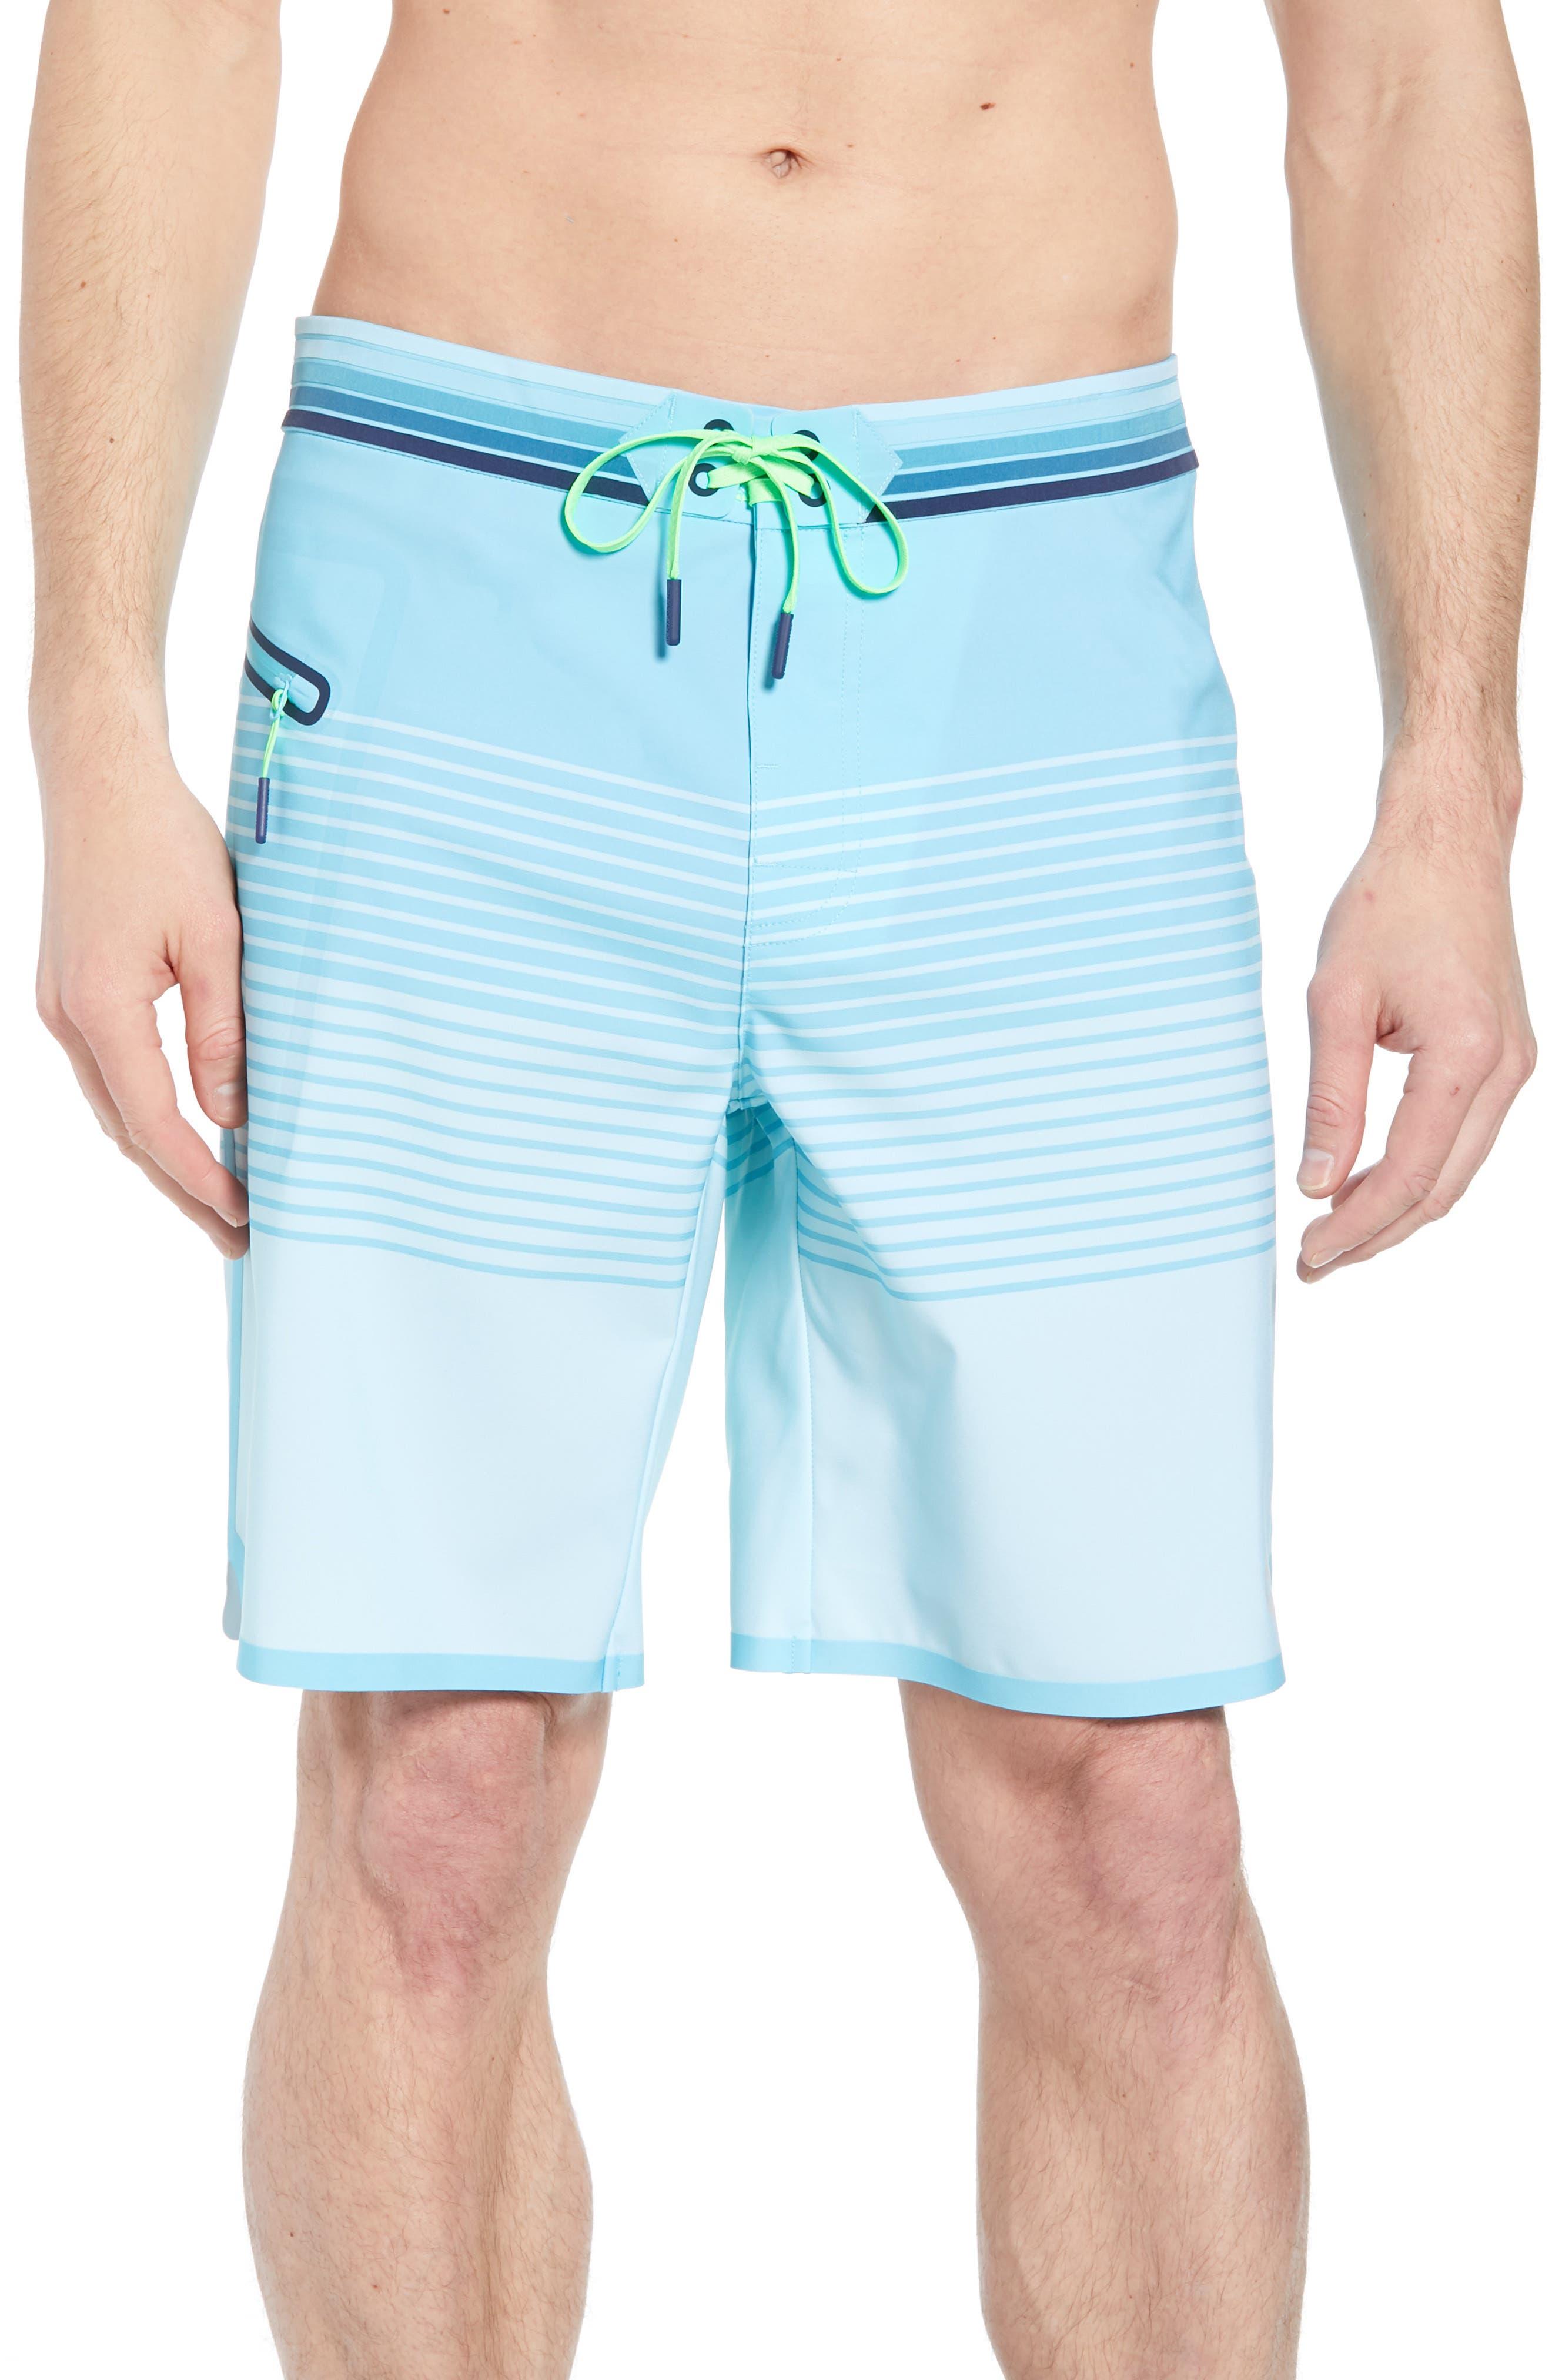 Sculplin Stripe Tech Board Shorts,                         Main,                         color, Turquoise